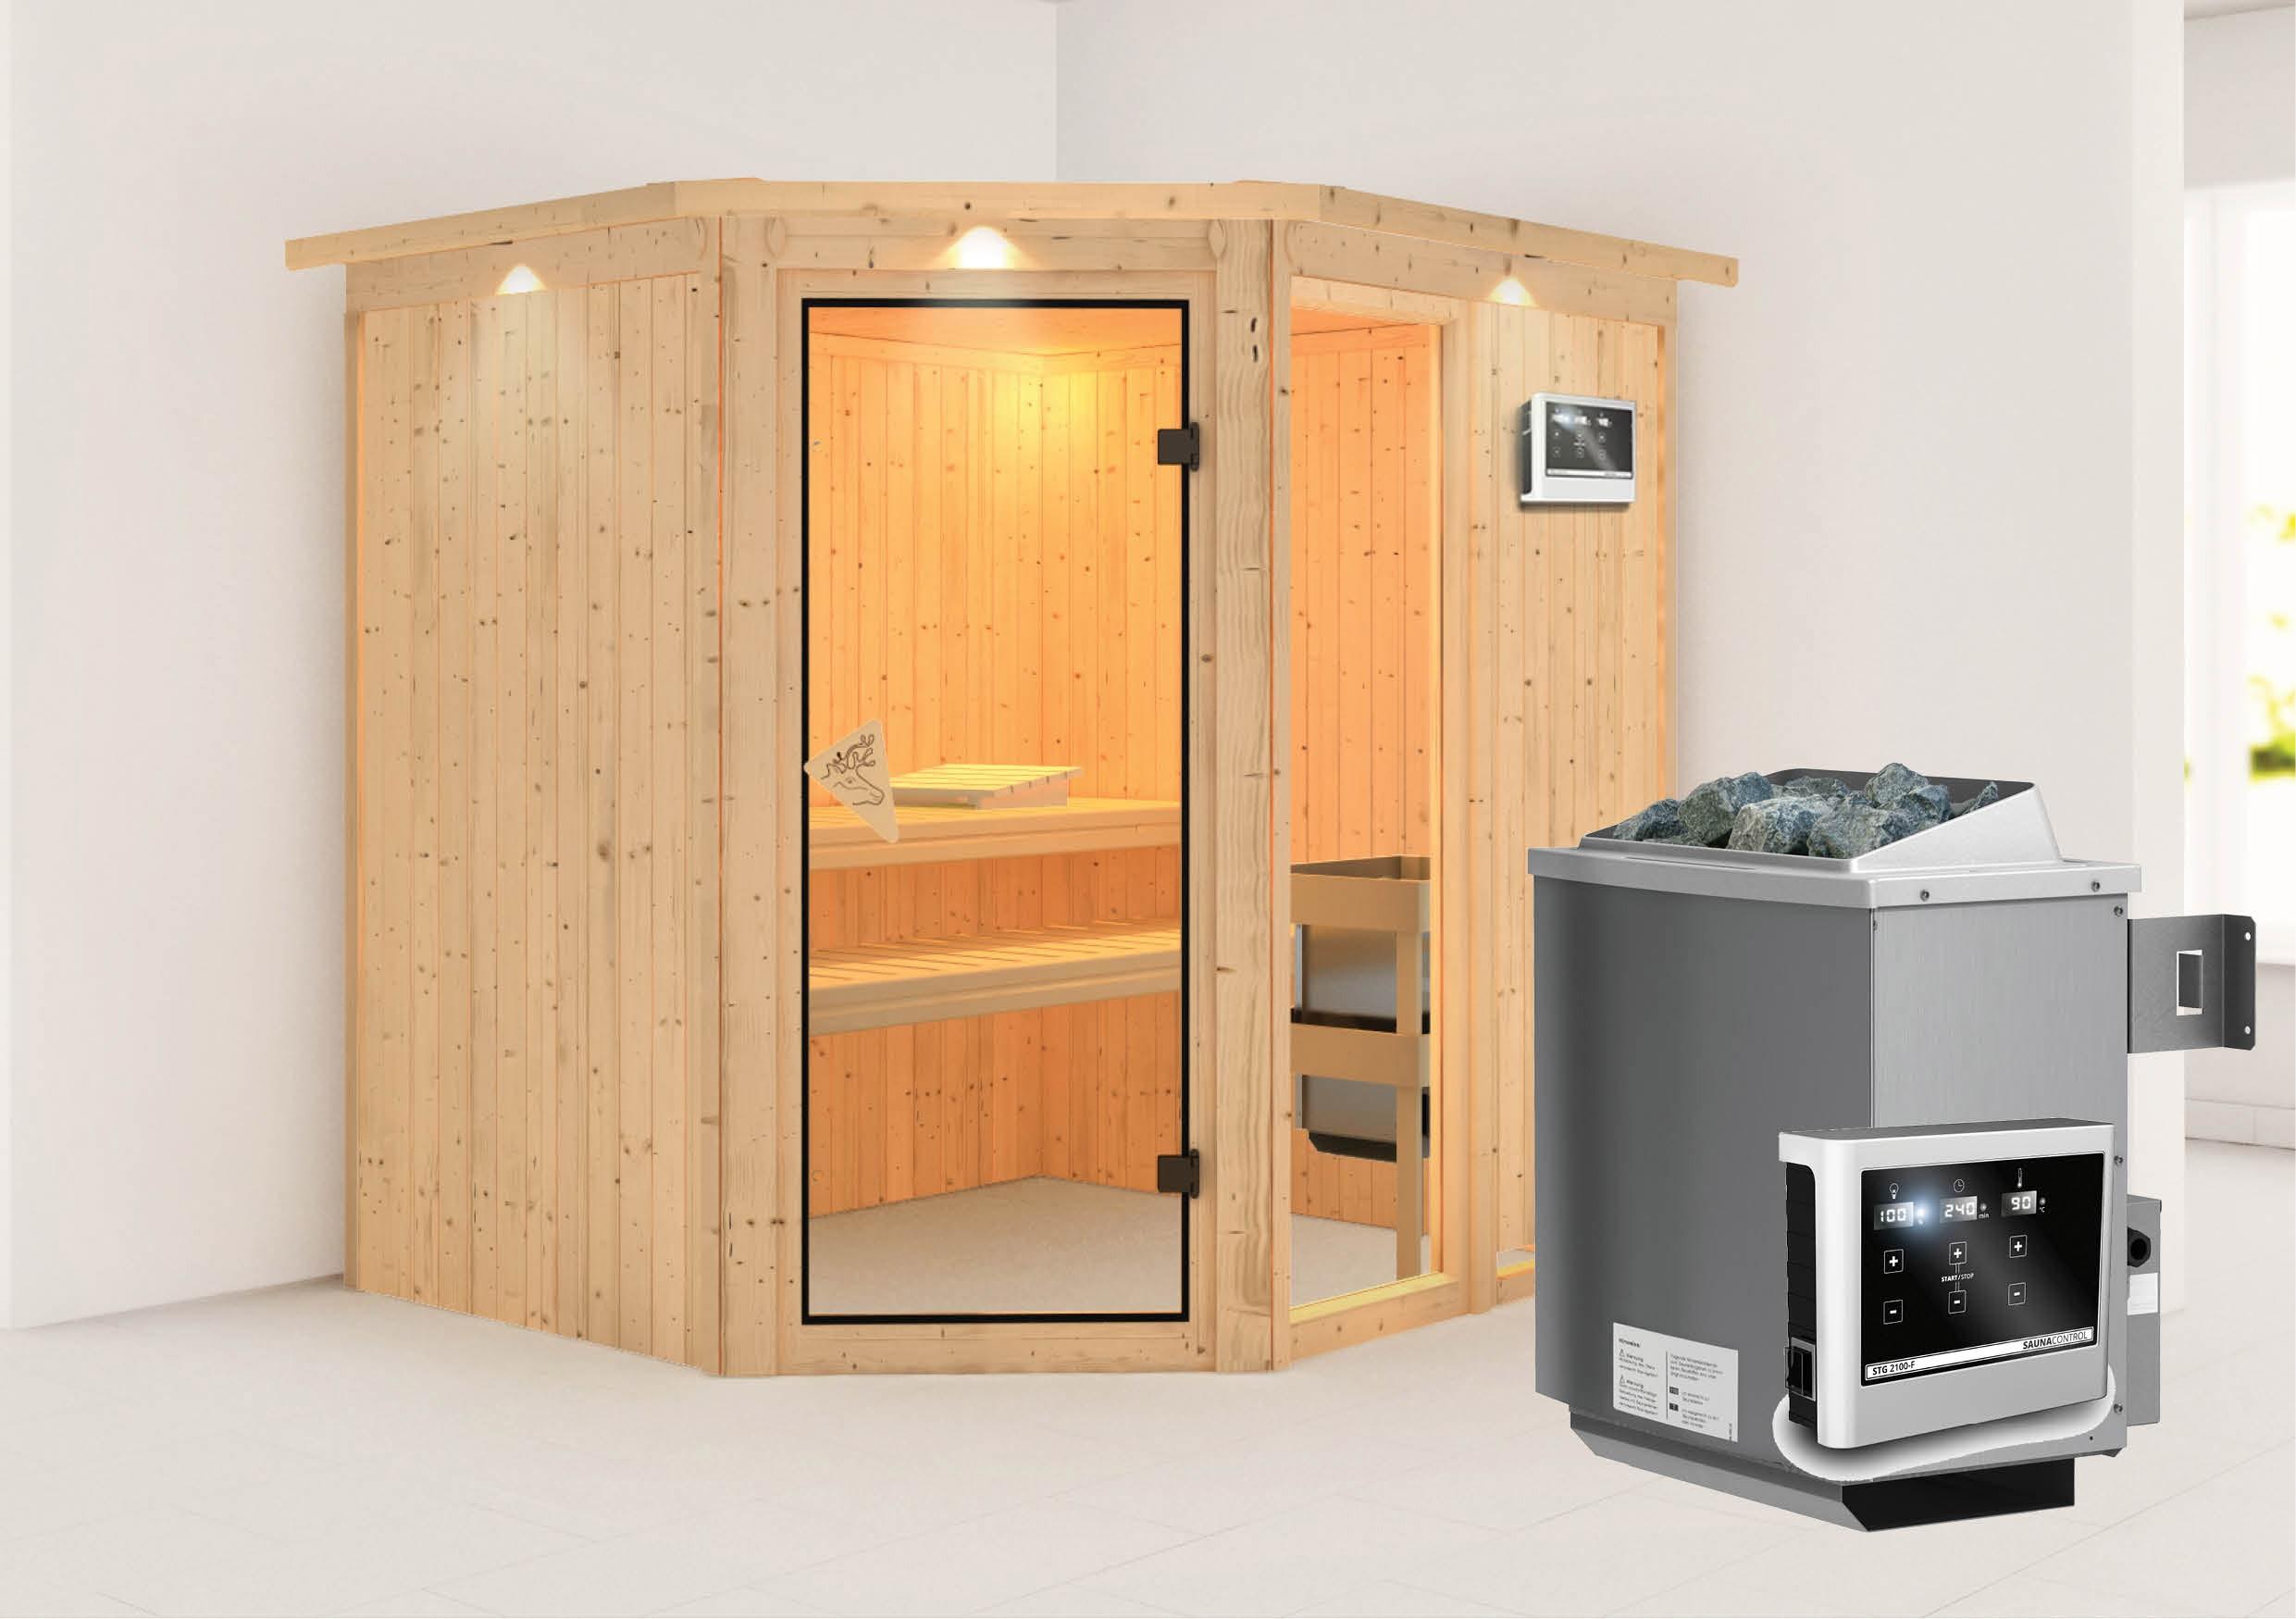 Karibu Sauna Fiona 2 68mm Dachkranz + Ofen 9kW extern classic Tür Bild 1